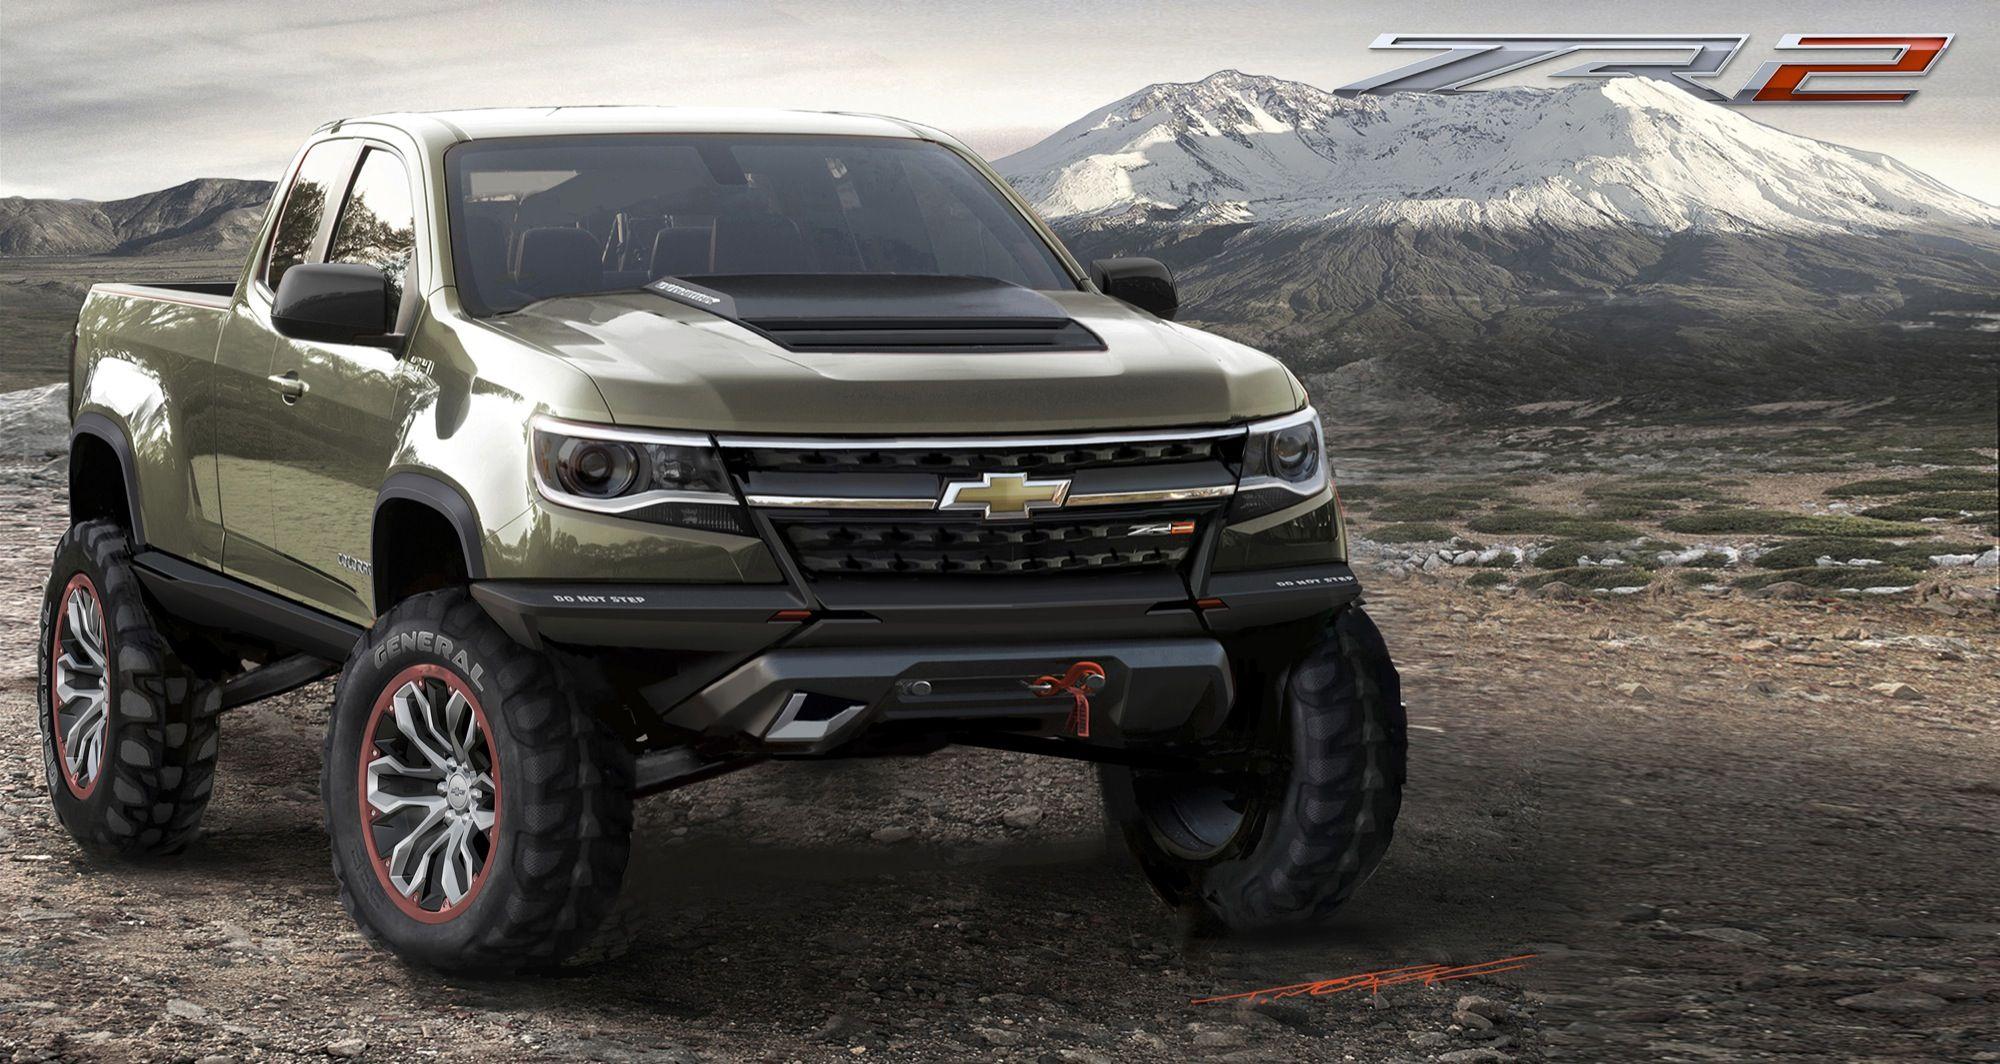 2015 Chevrolet Colorado Zr2 Concept Is Ready To Rock La 2014 Chevrolet Colorado Autos Chevrolet Camionetas